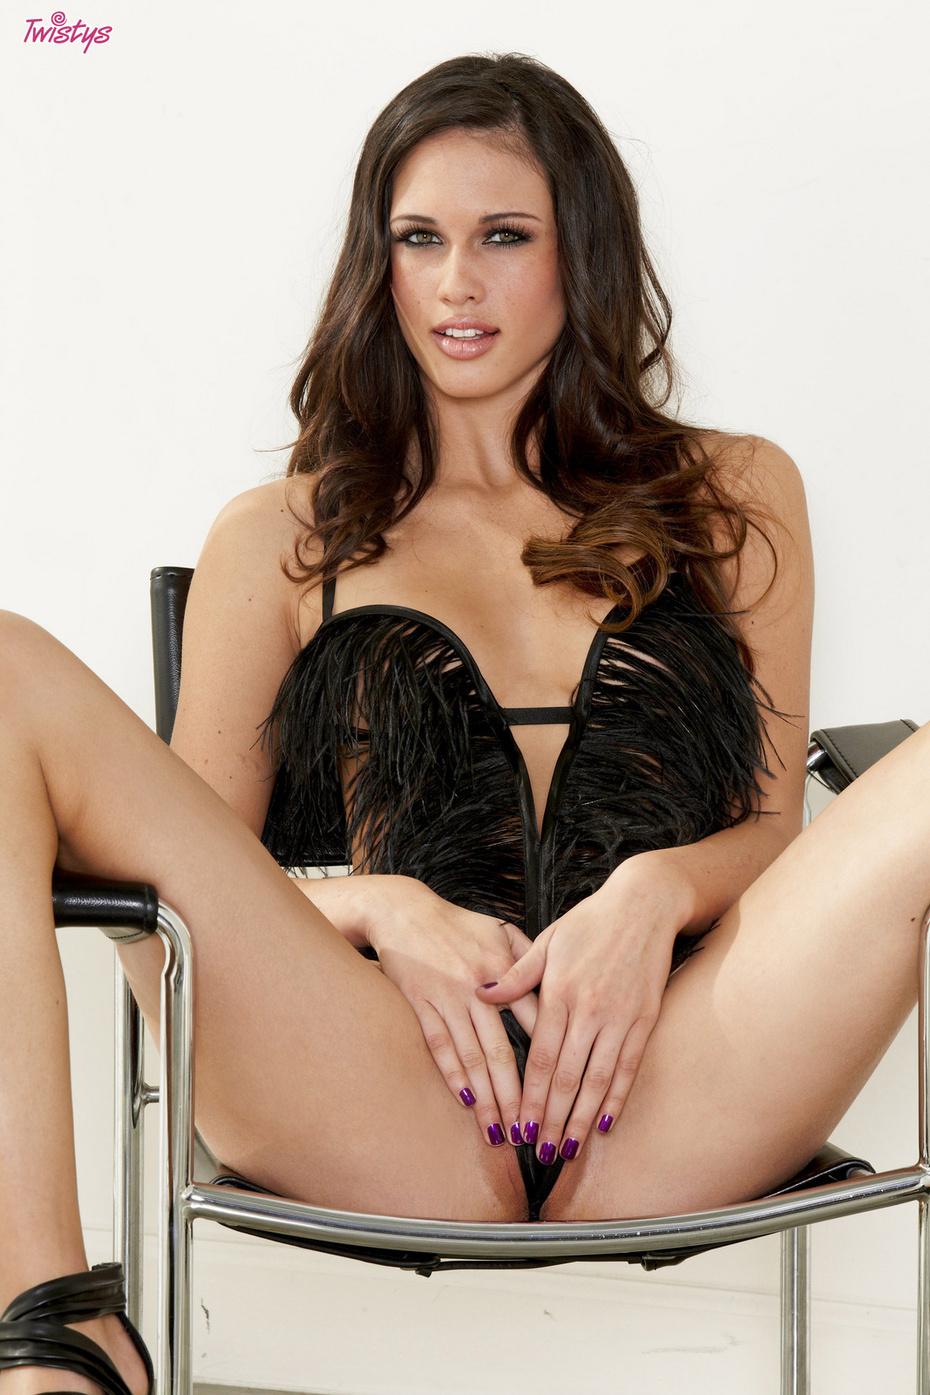 Tiffany Thompson Posa Desnuda Y Depilada Xnostarscom